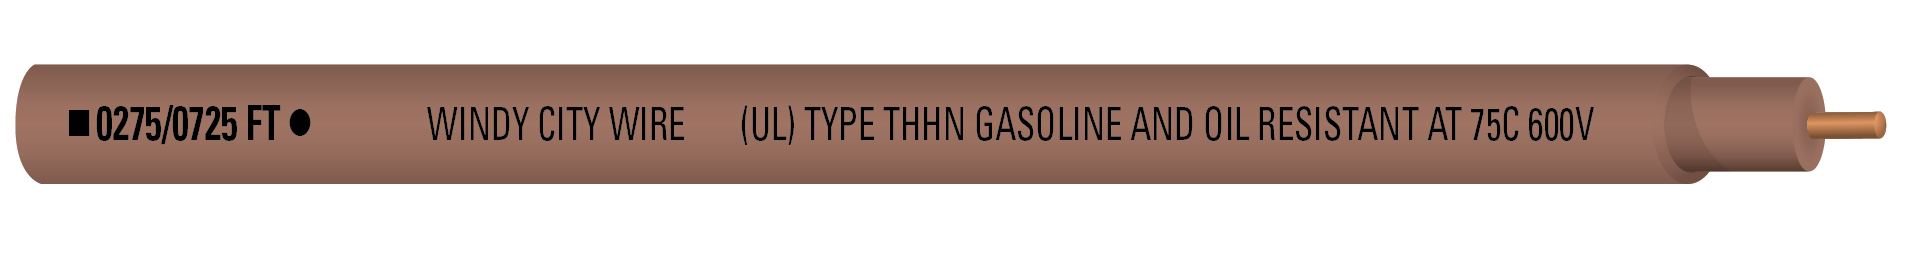 14-1C SOL THHN 600V Brn